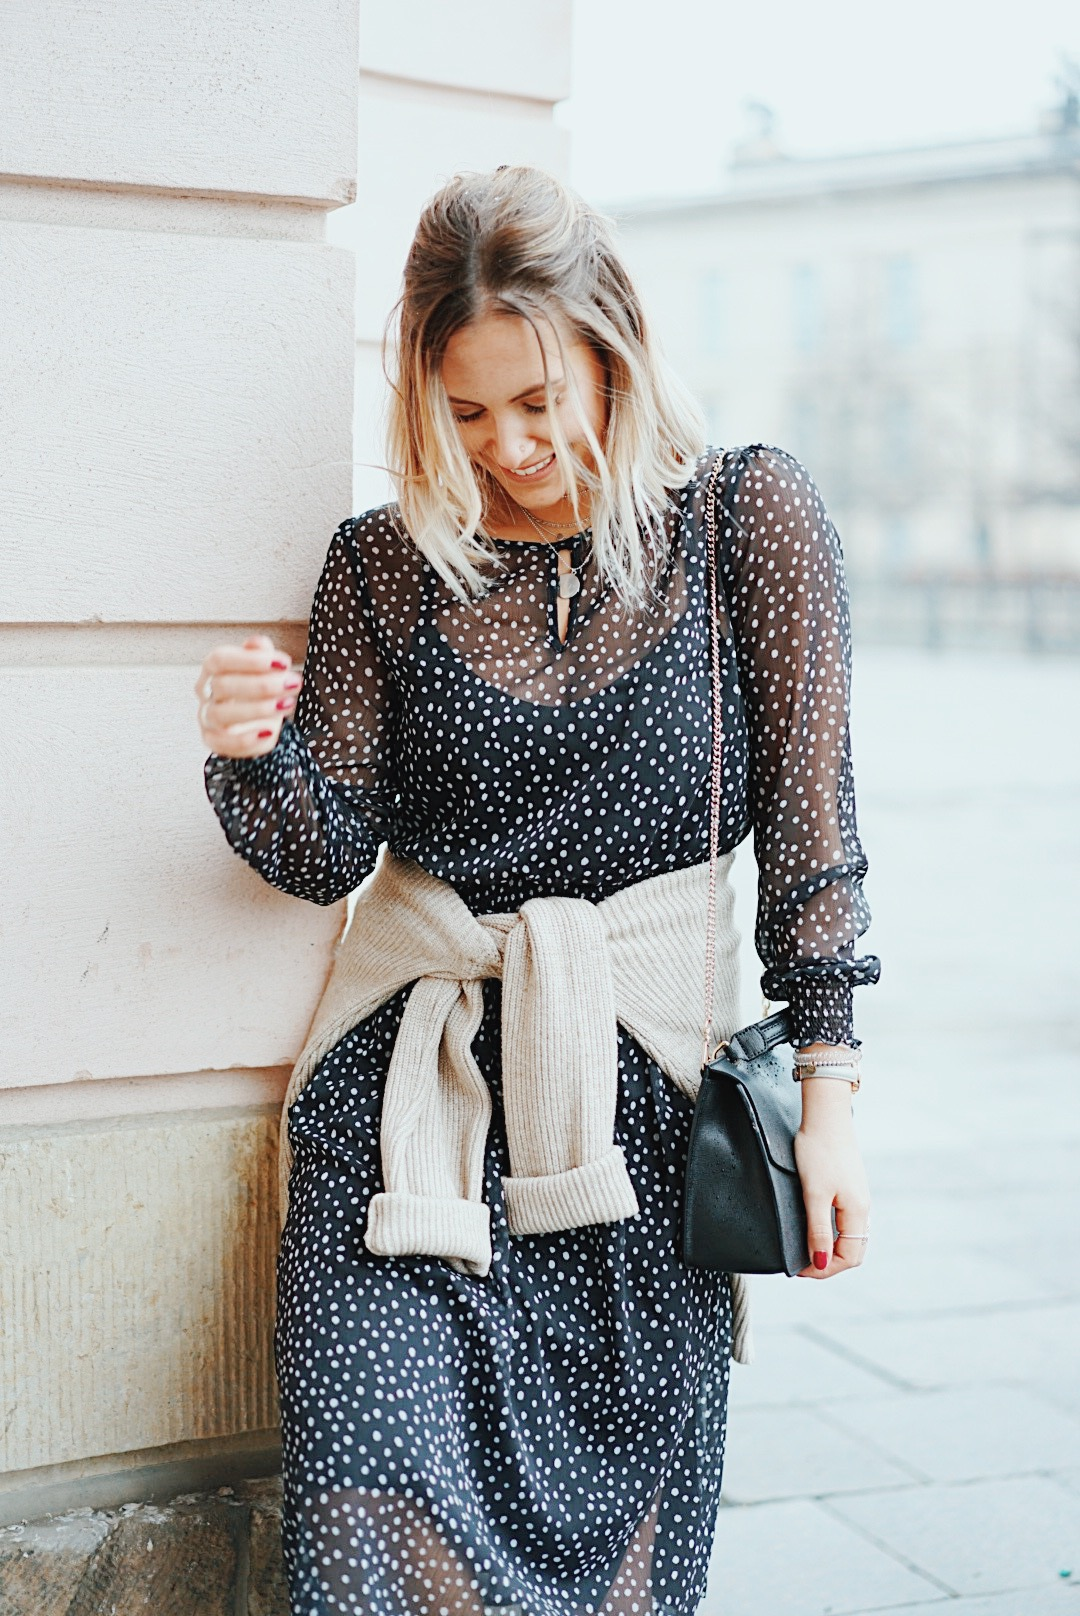 casual-chic-look-esprit-fashion-fashion-for-ffranzy-modeblogger-fashionblogger-cologne-koeln-lifestyleblogger-deutschland